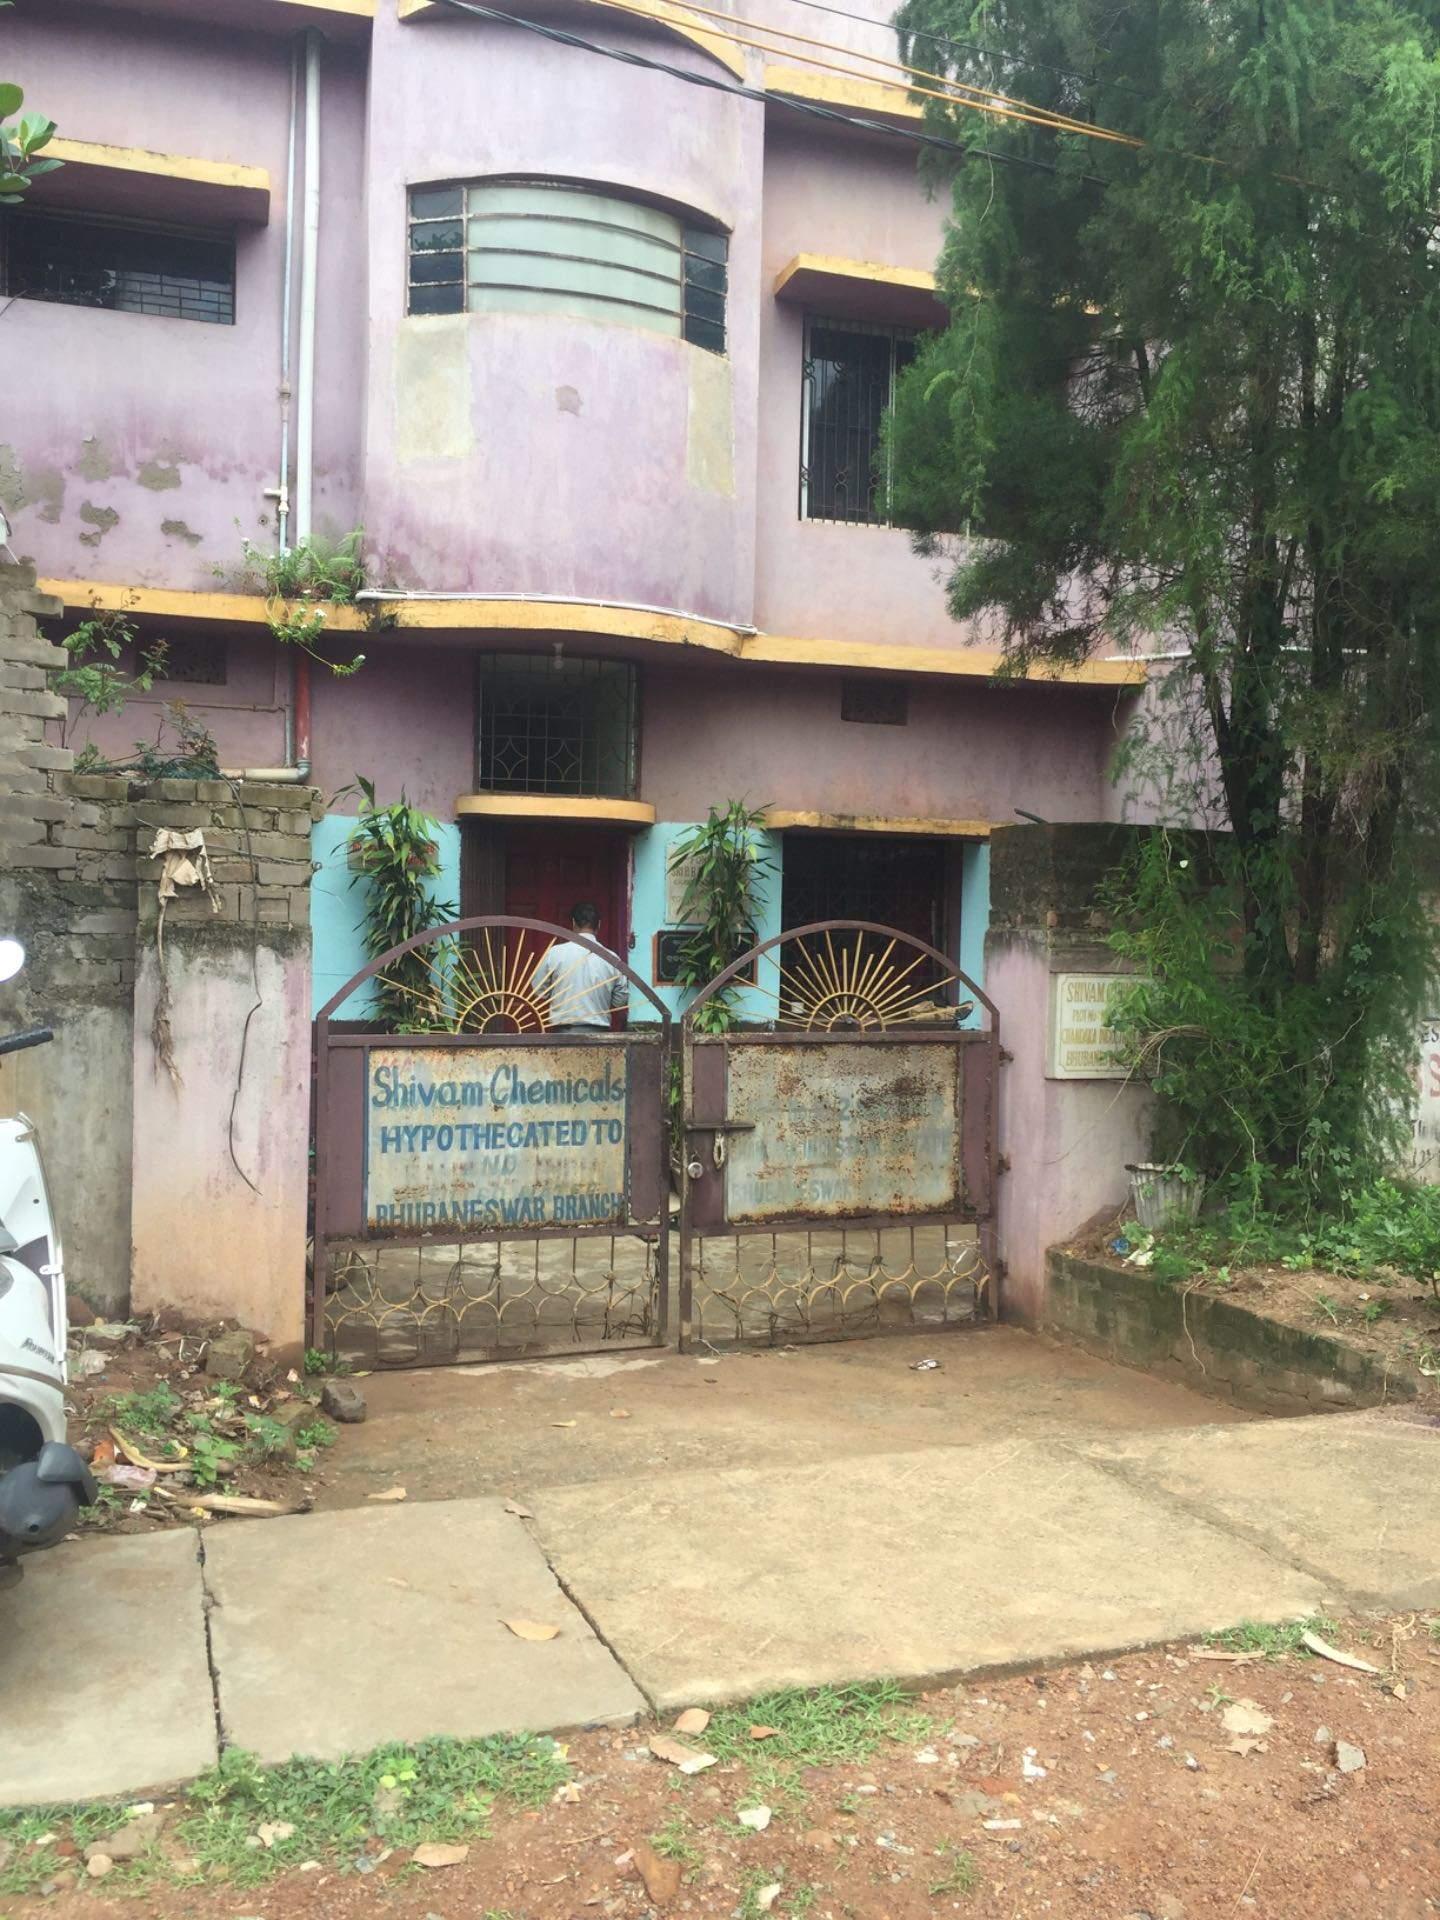 Top 10 Phenyl Manufacturers in Bhubaneshwar - Justdial